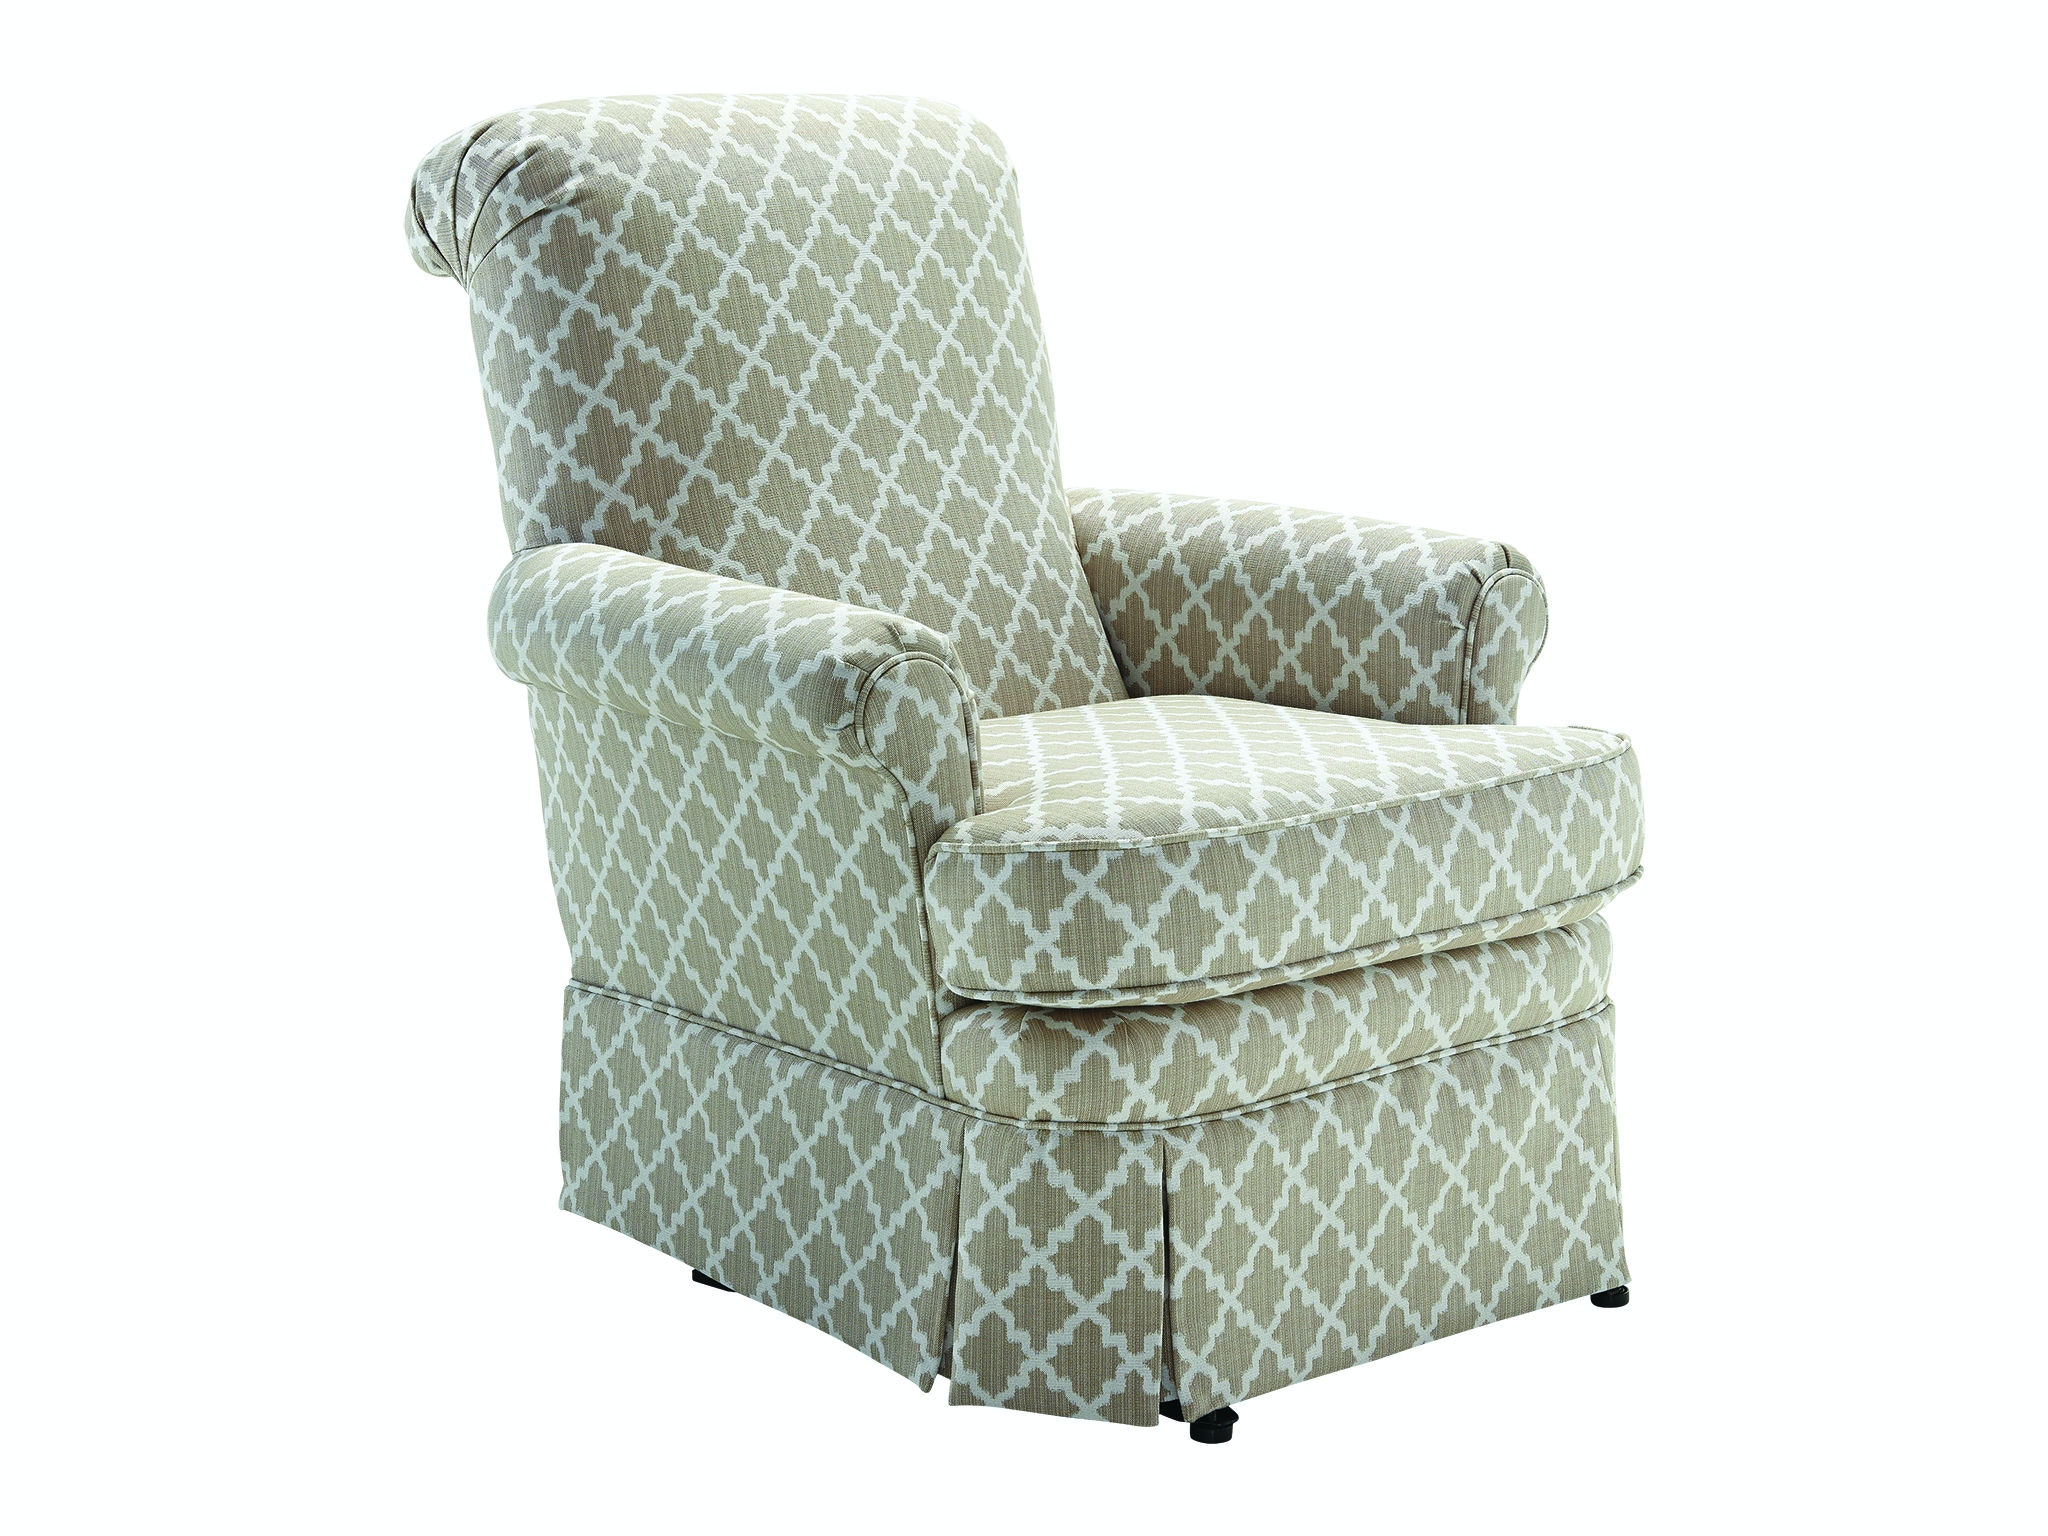 Best Home Furnishings Living Room Swivel Rocker 1219   Burke Furniture Inc.    Lexington, KY